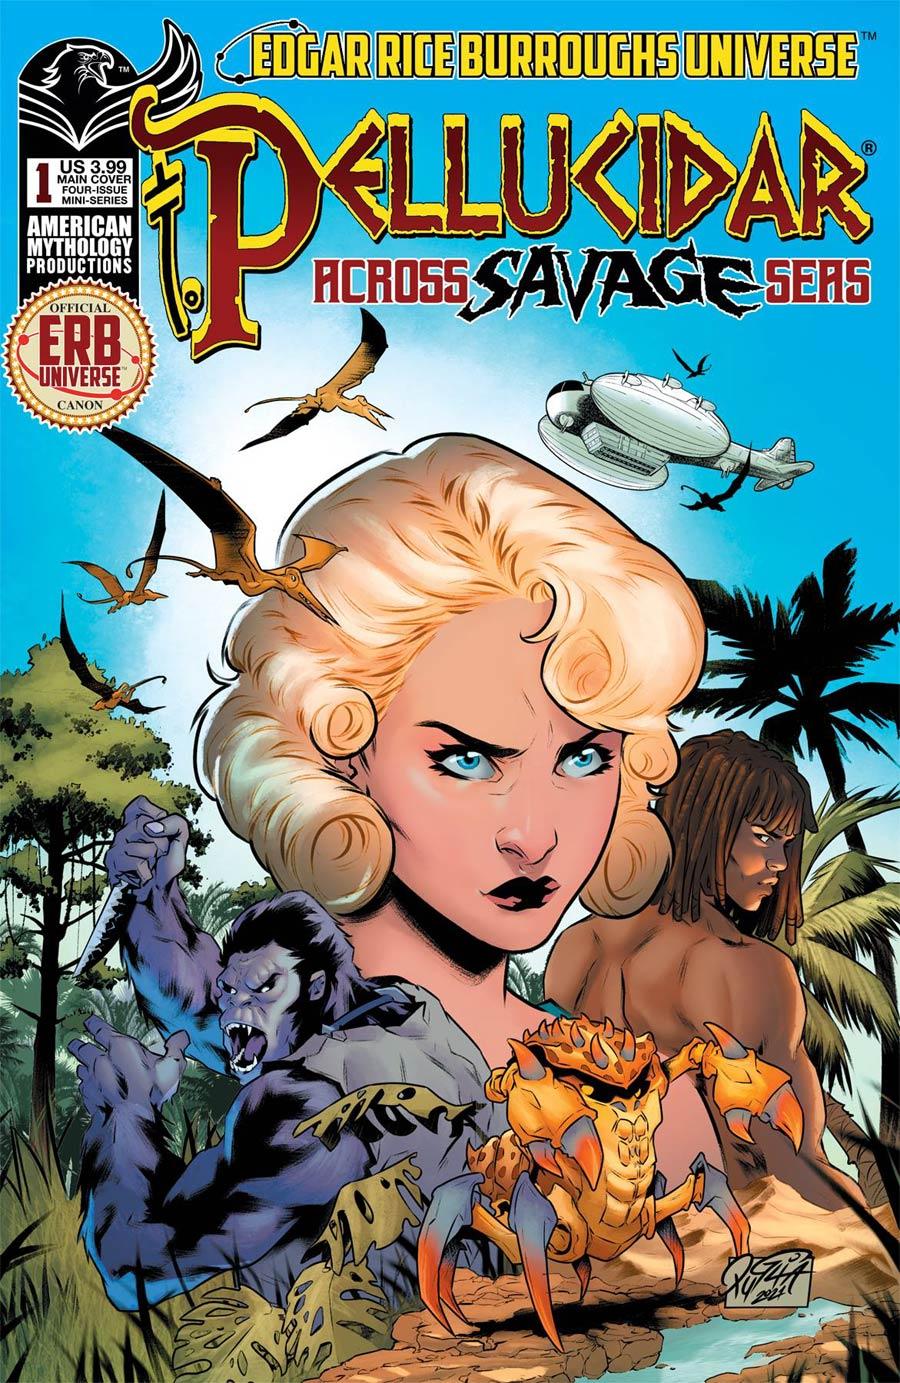 Pellucidar Across Savage Seas #1 Cover A Regular Miriana Puglia Cover